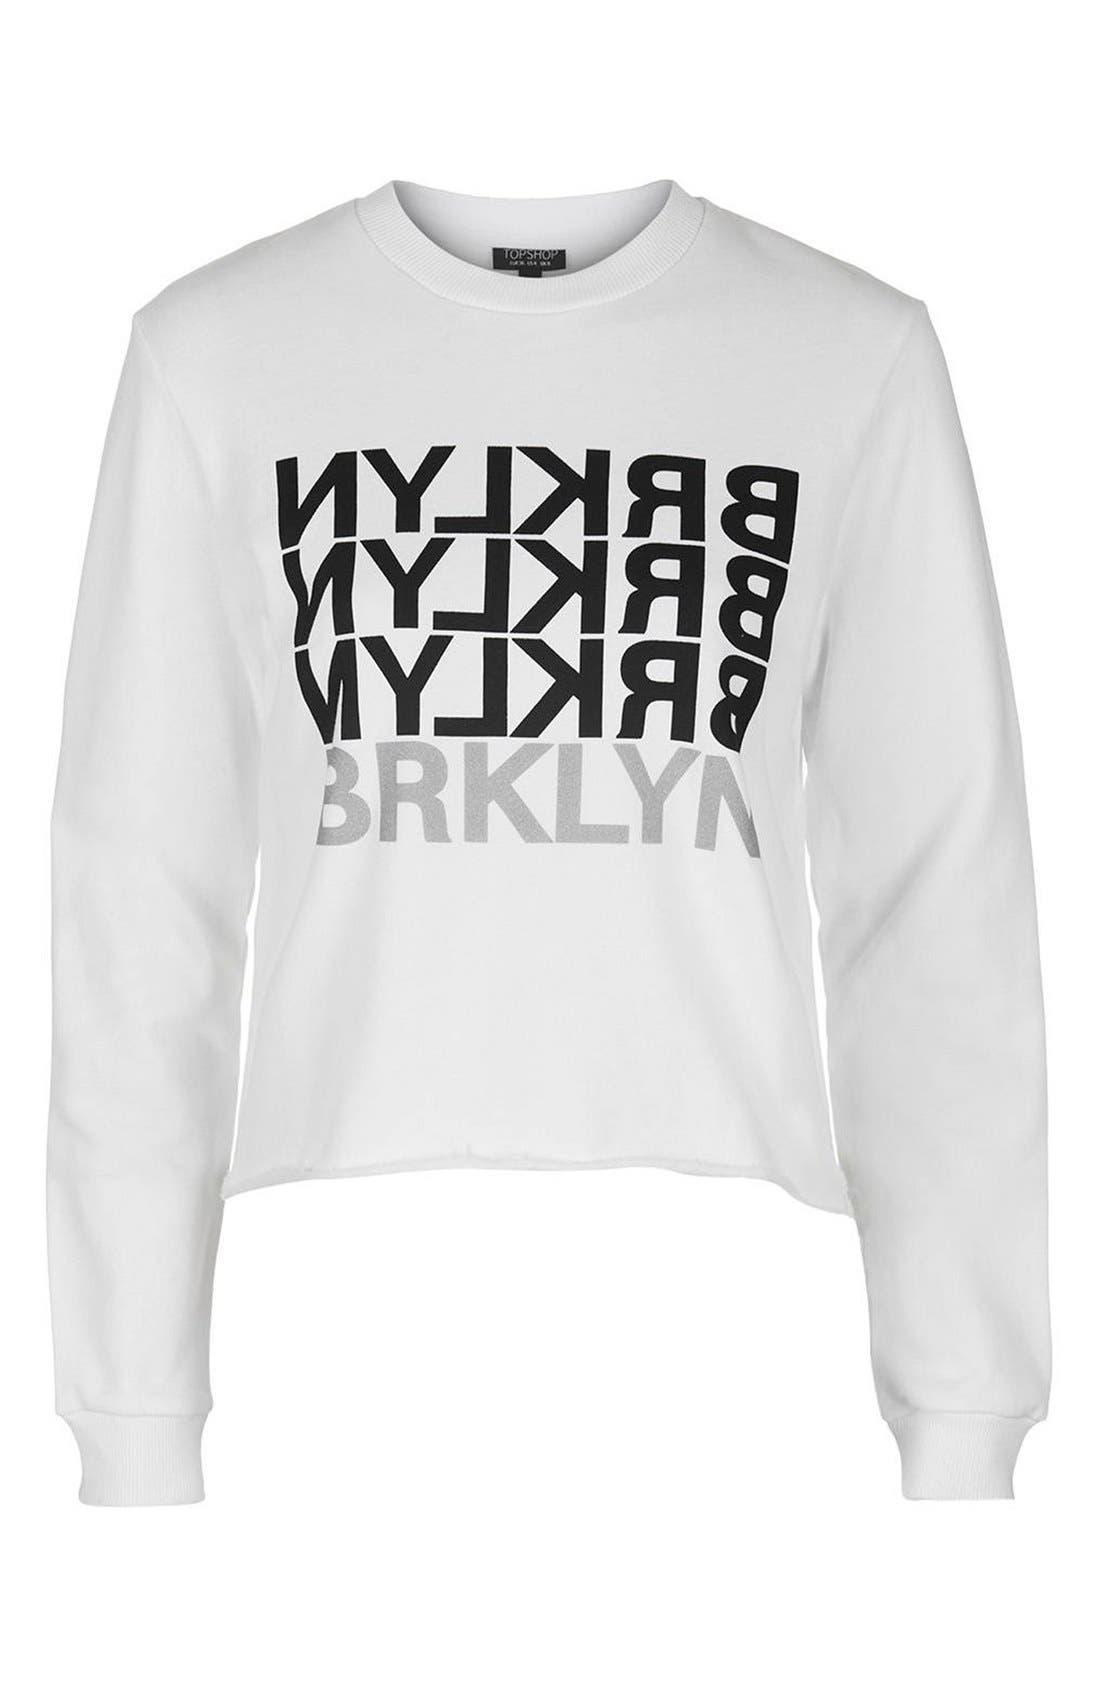 Alternate Image 4  - Topshop 'Brklyn' Graphic Sweatshirt